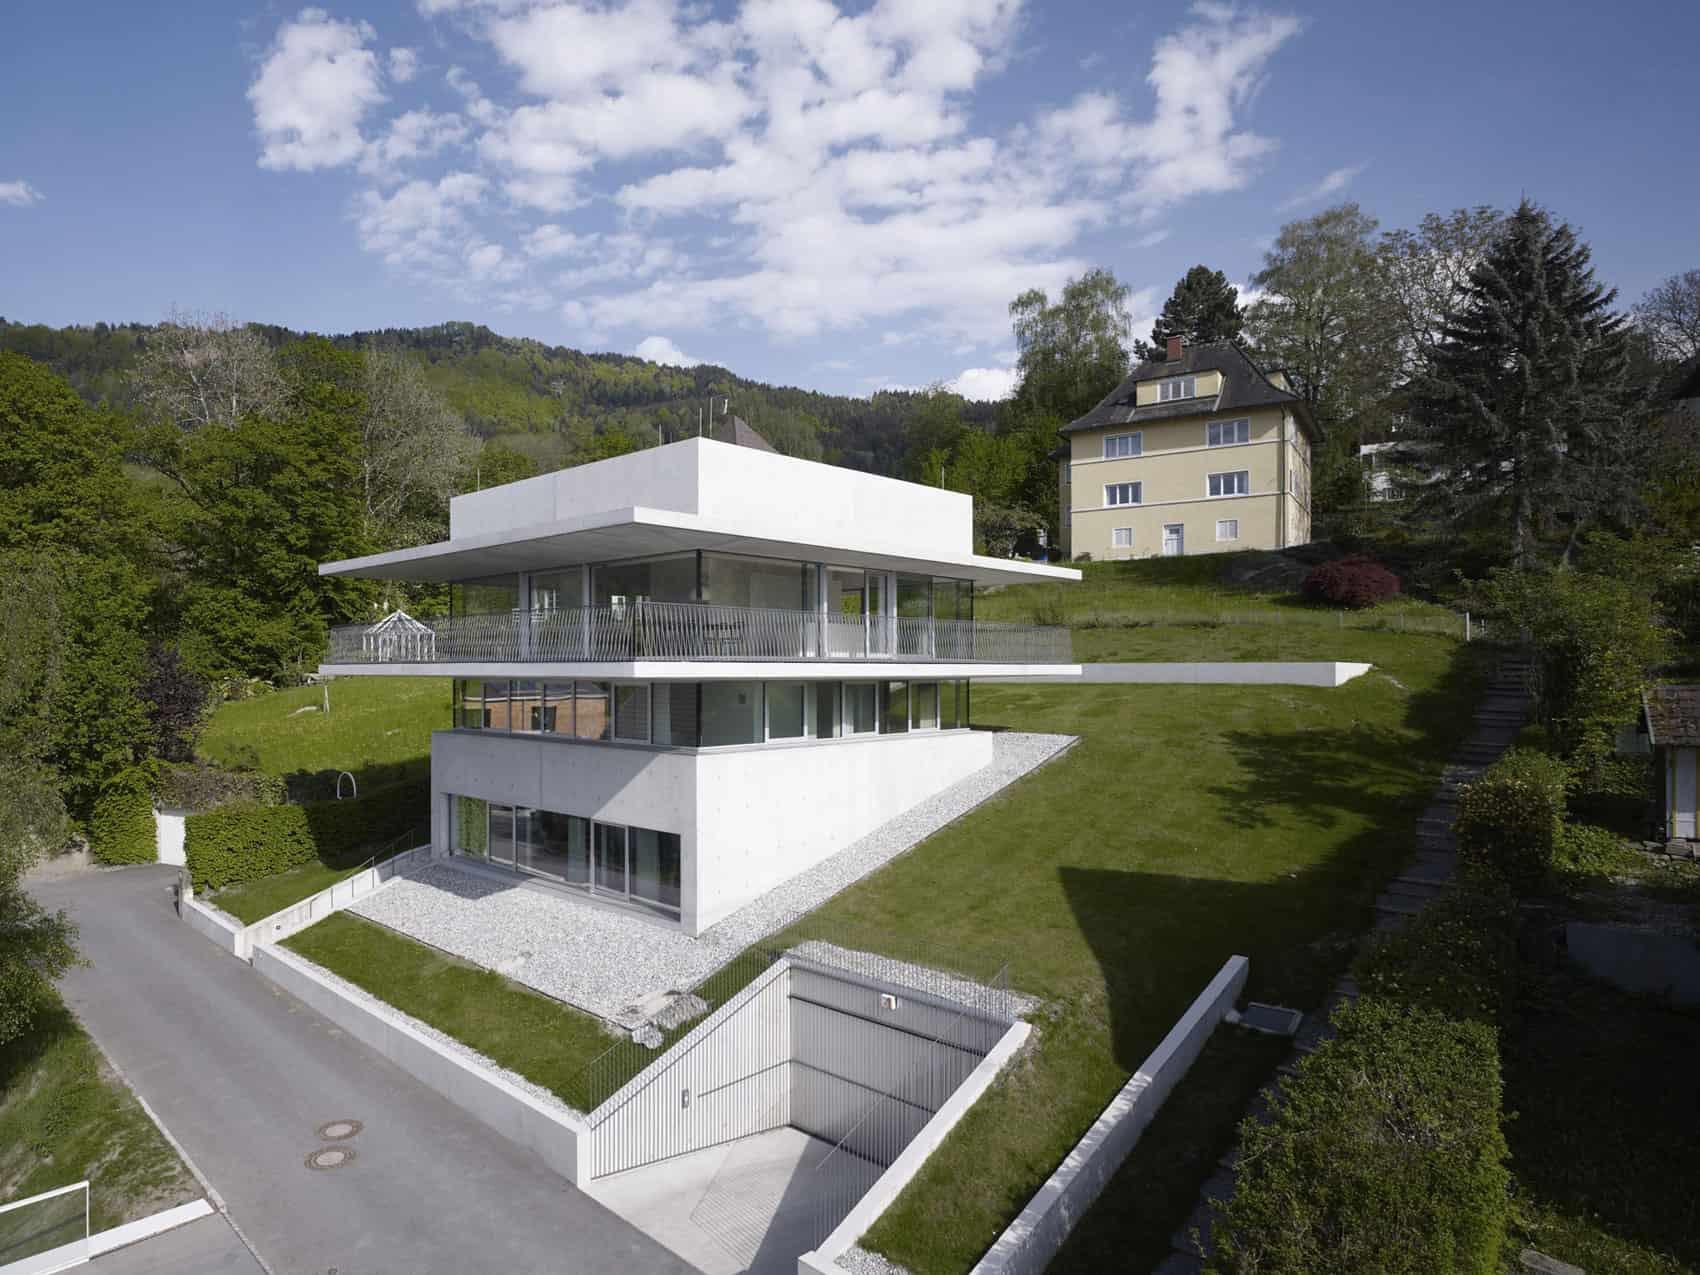 house by the lake by marte marte architekten. Black Bedroom Furniture Sets. Home Design Ideas